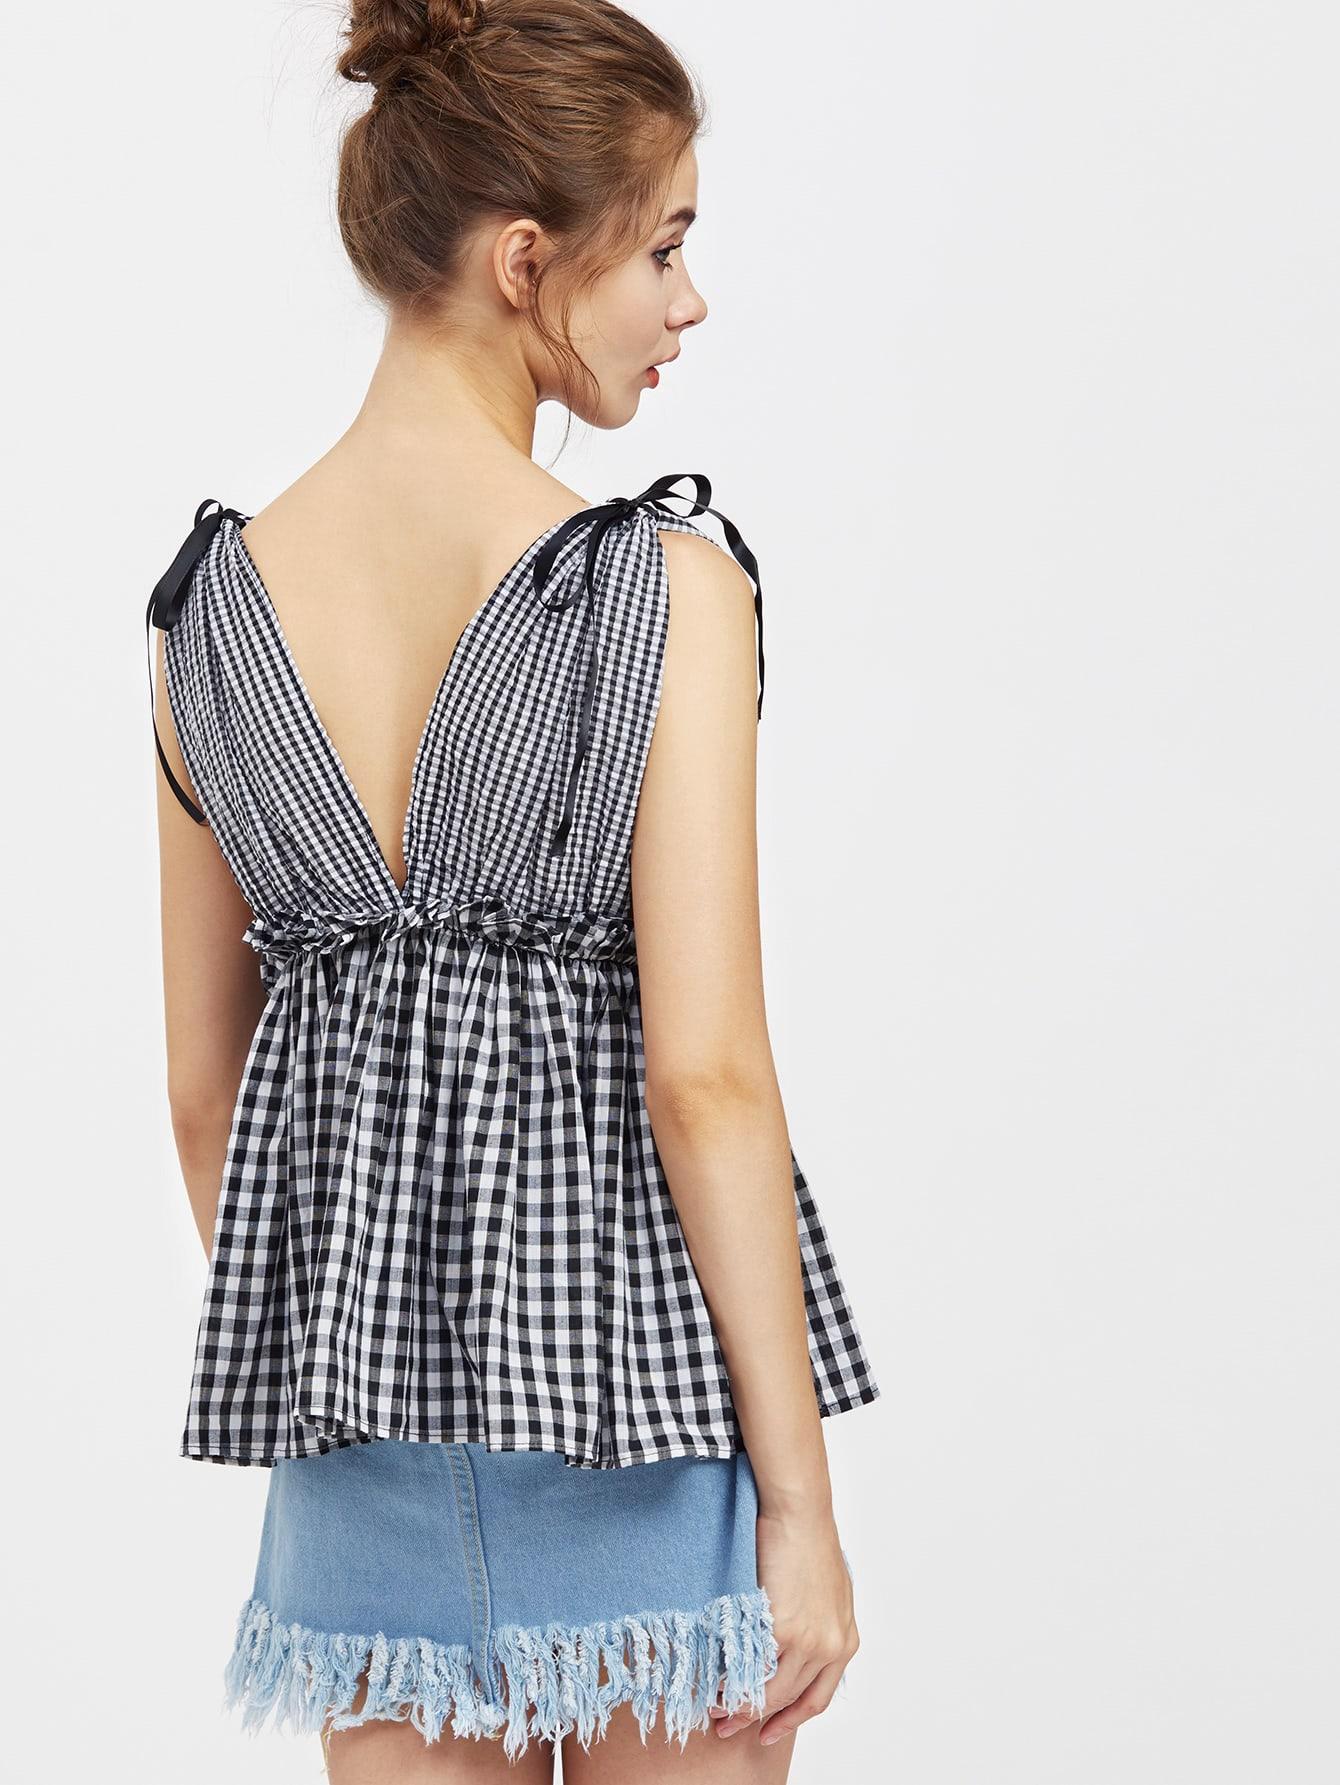 blouse170508007_2